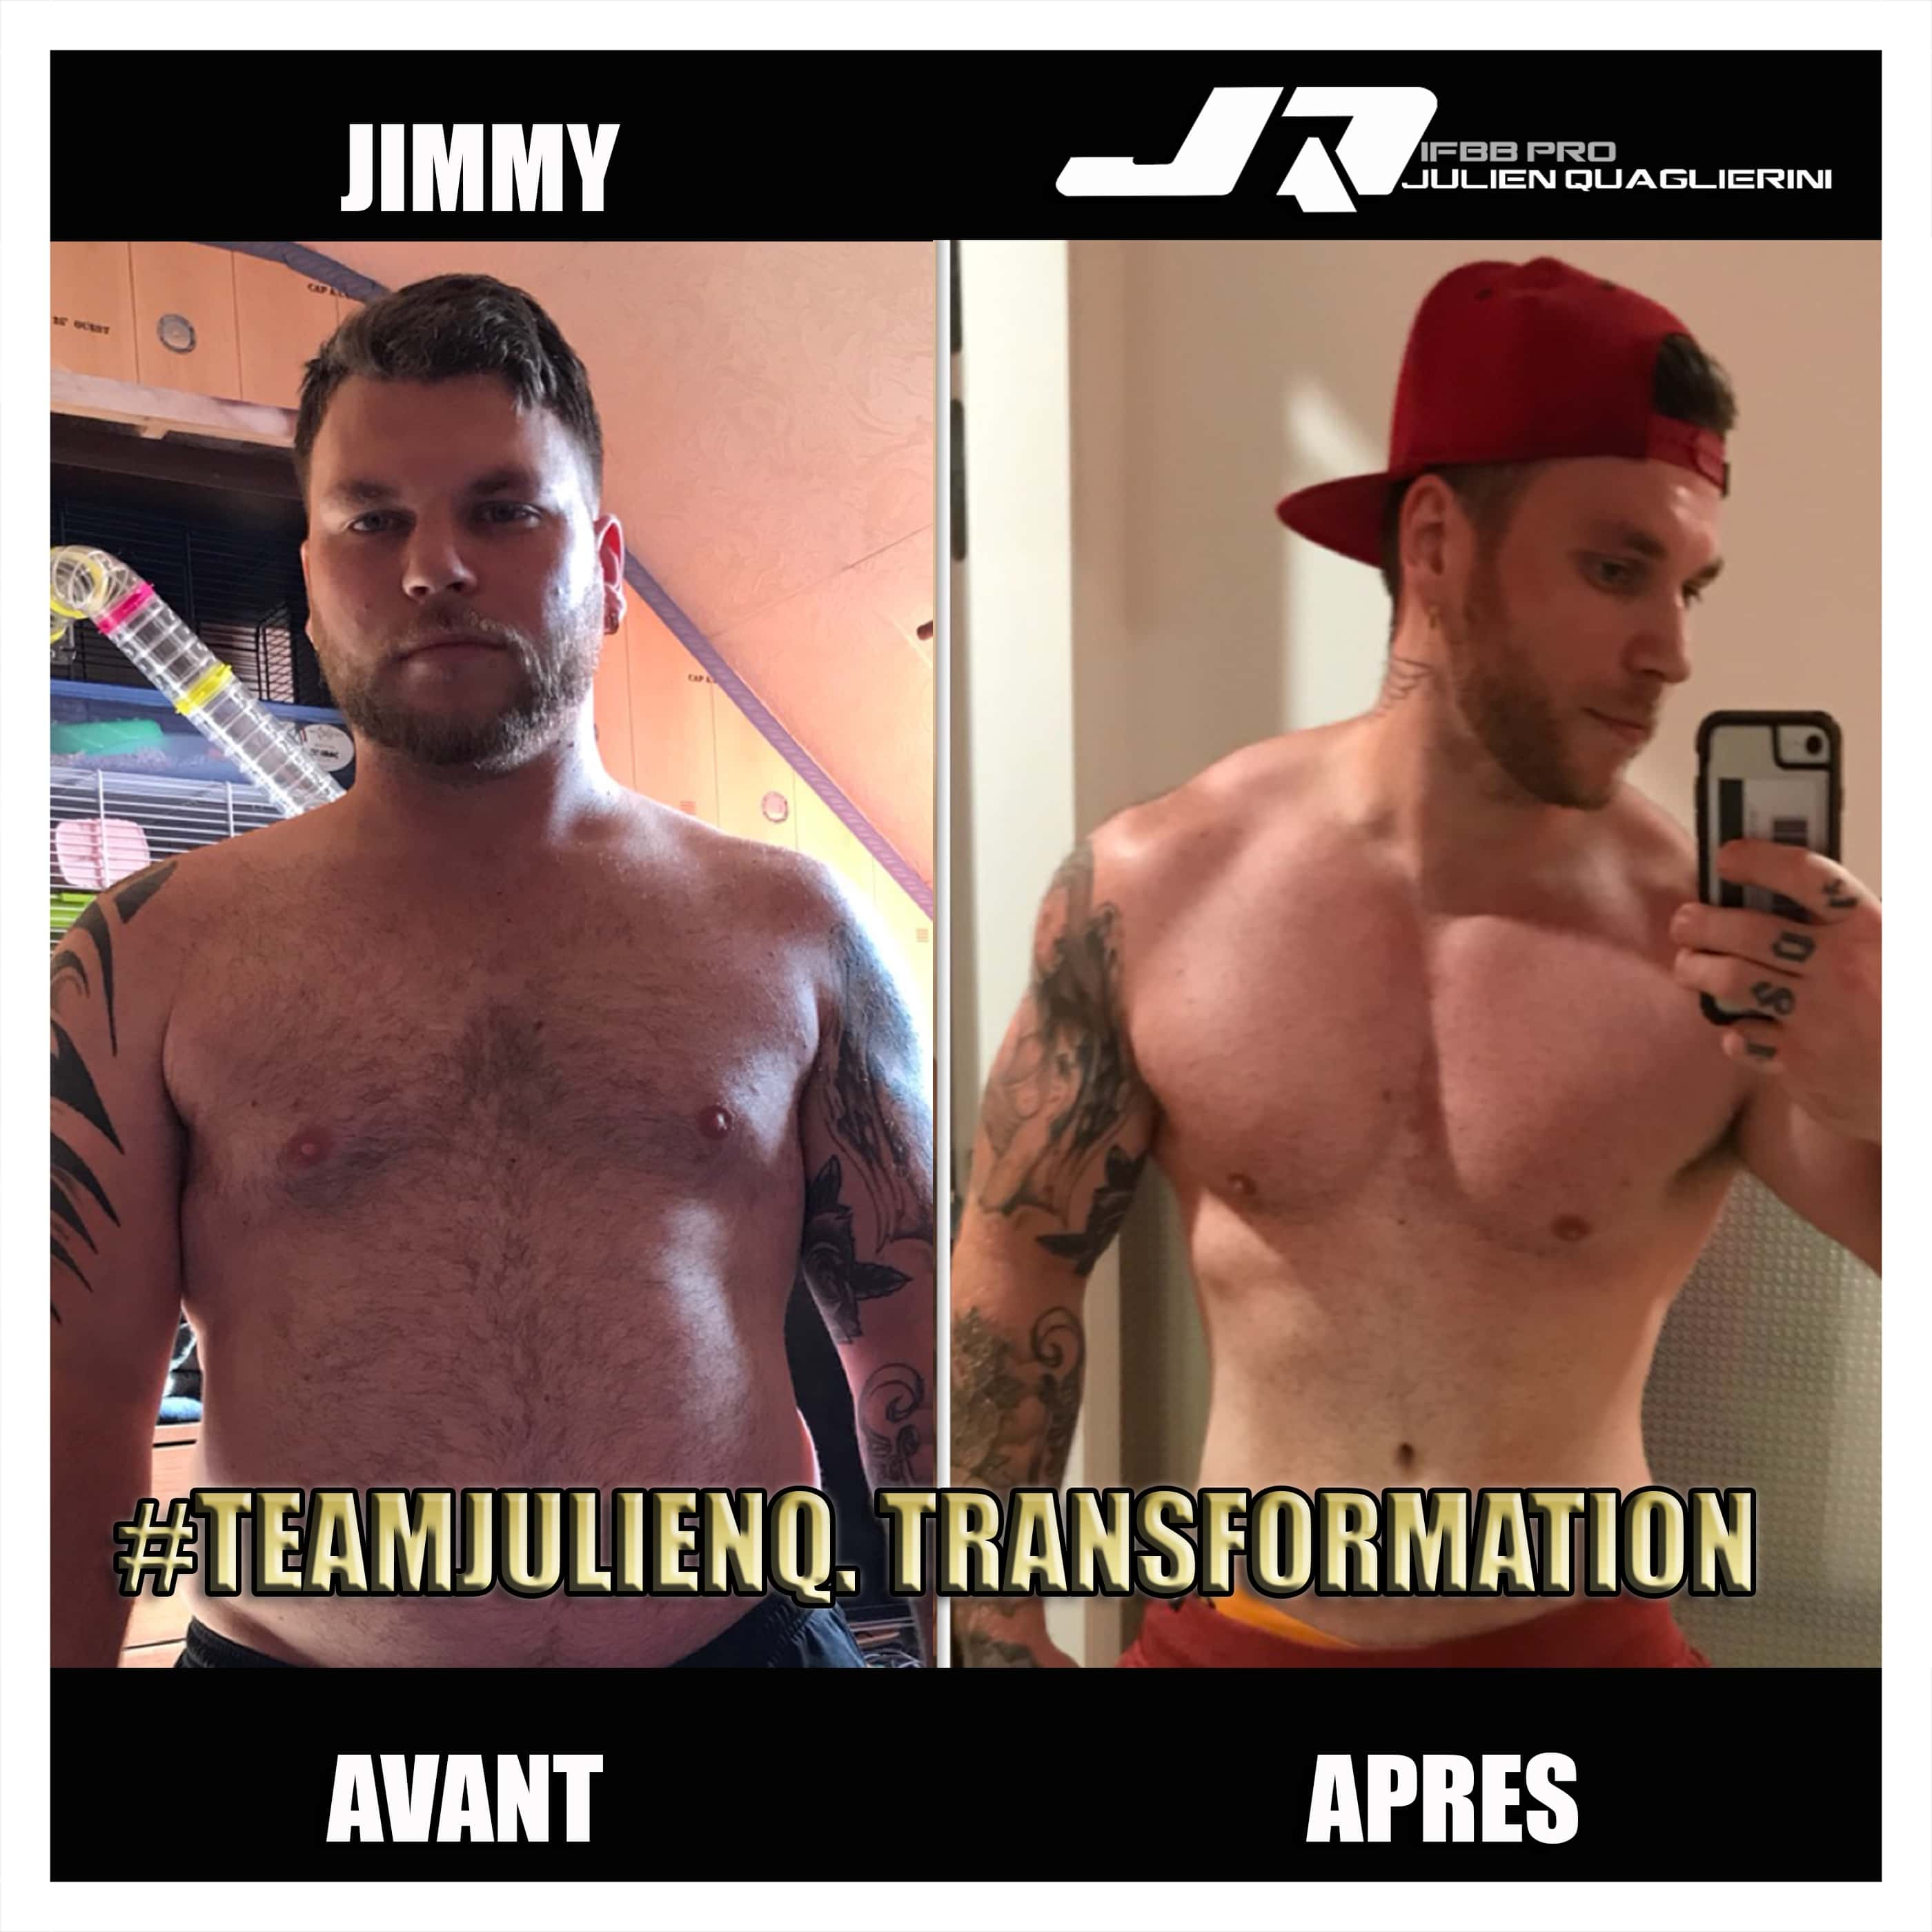 JIMMY_musculation avant apres